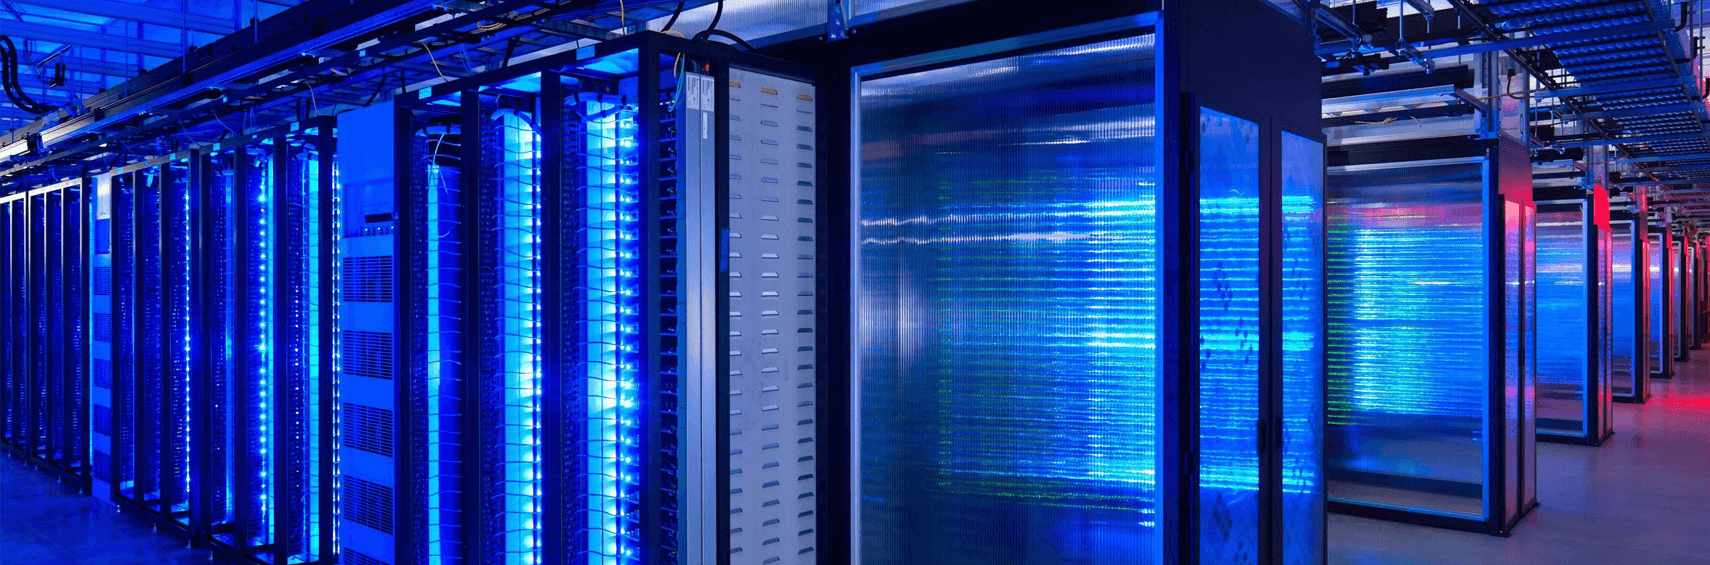 Система хранения информации Intelligent Policy Server